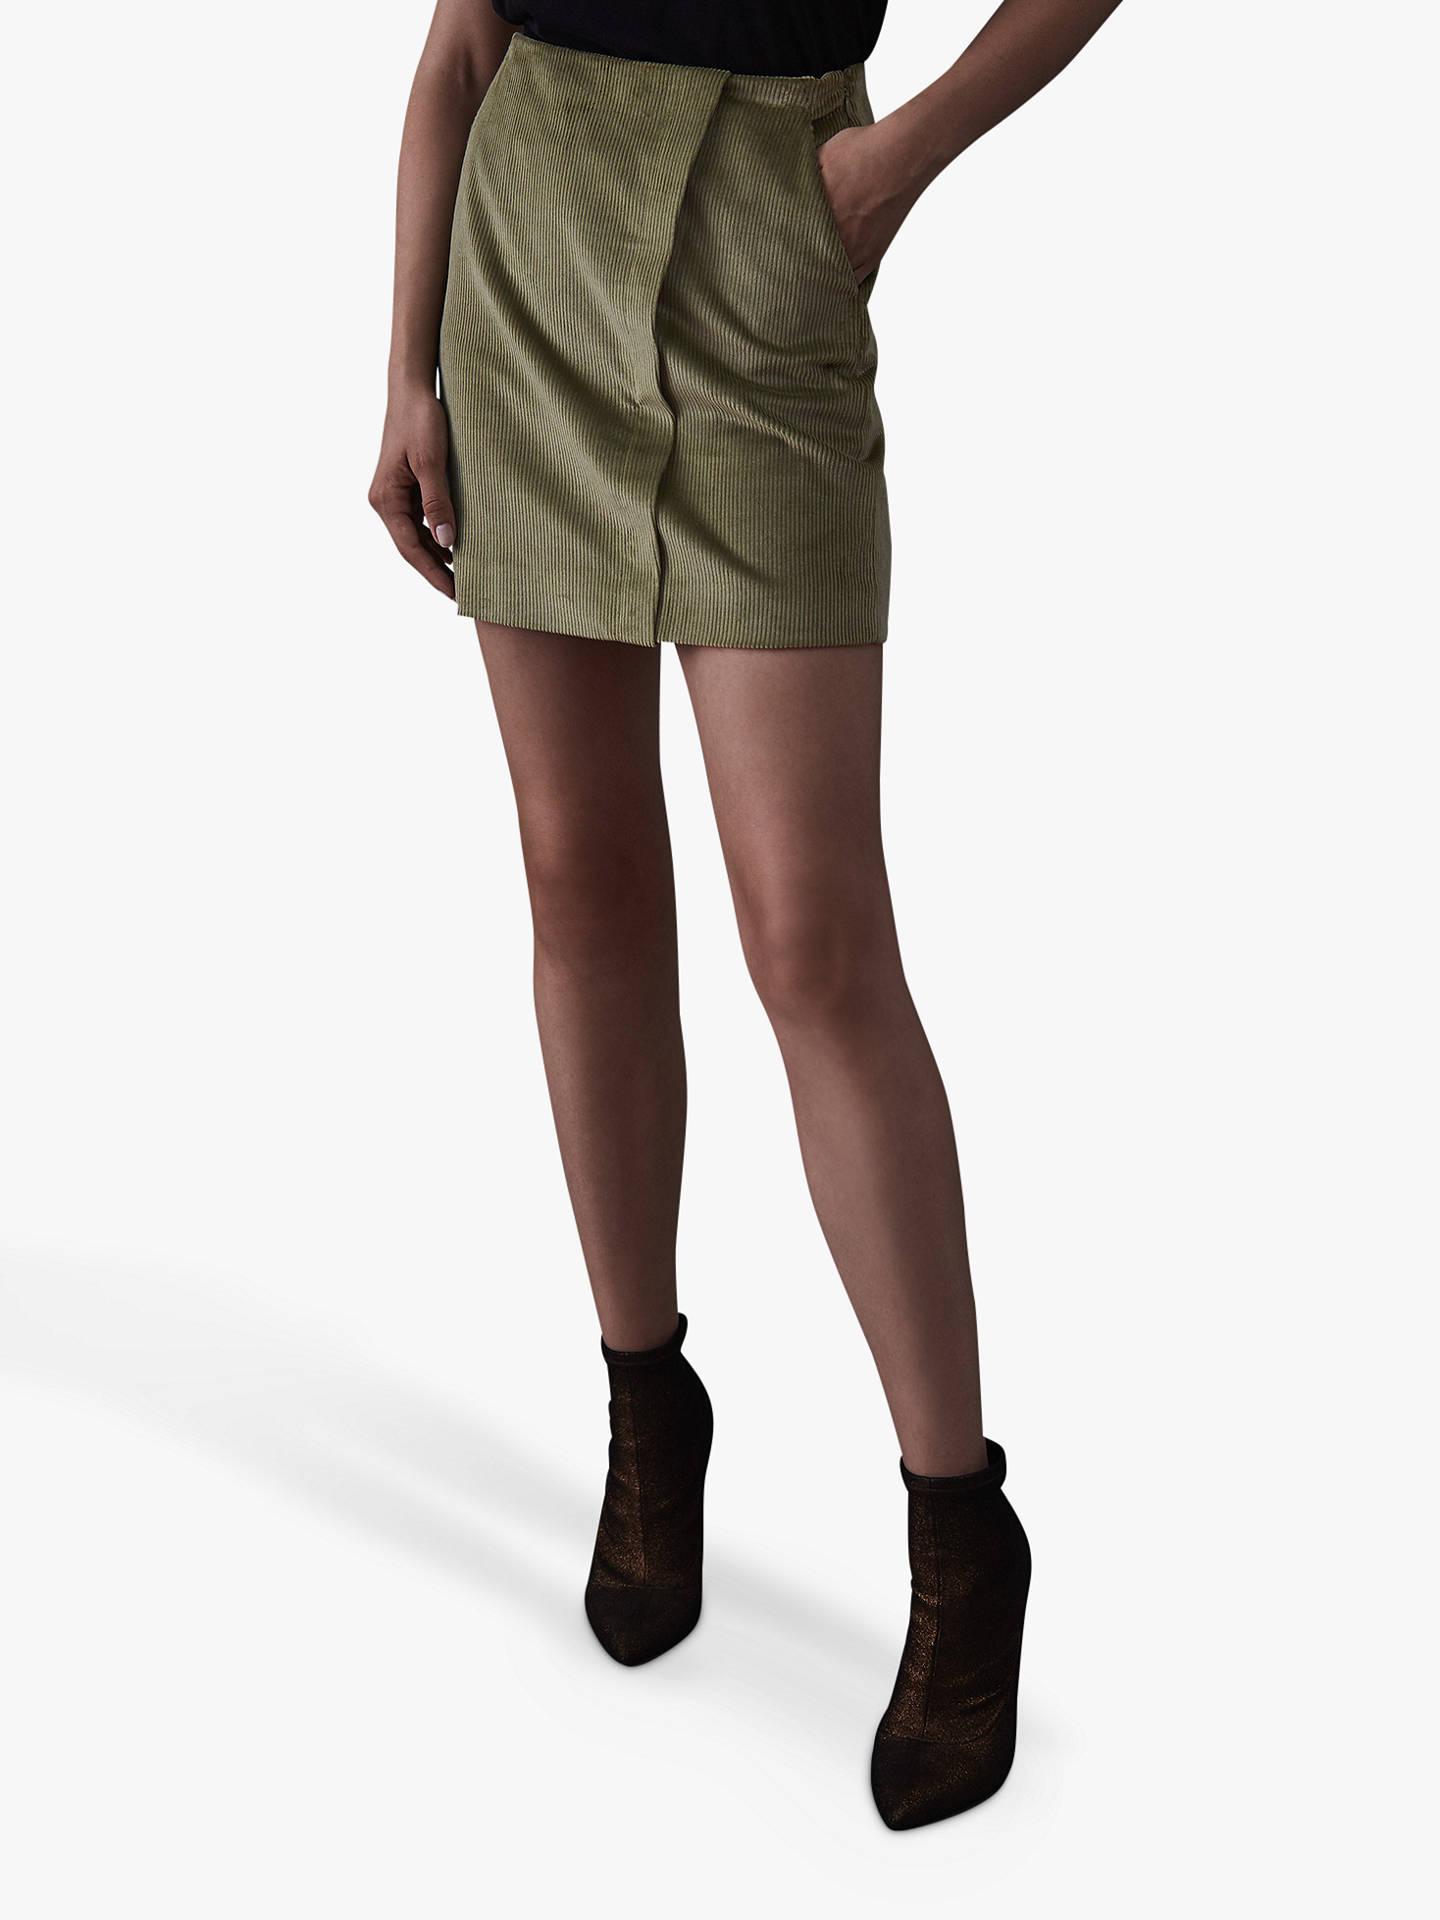 33d7ee95df Buy Reiss Francis Corduroy Mini Skirt, Green Mid, 8 Online at johnlewis.com  ...